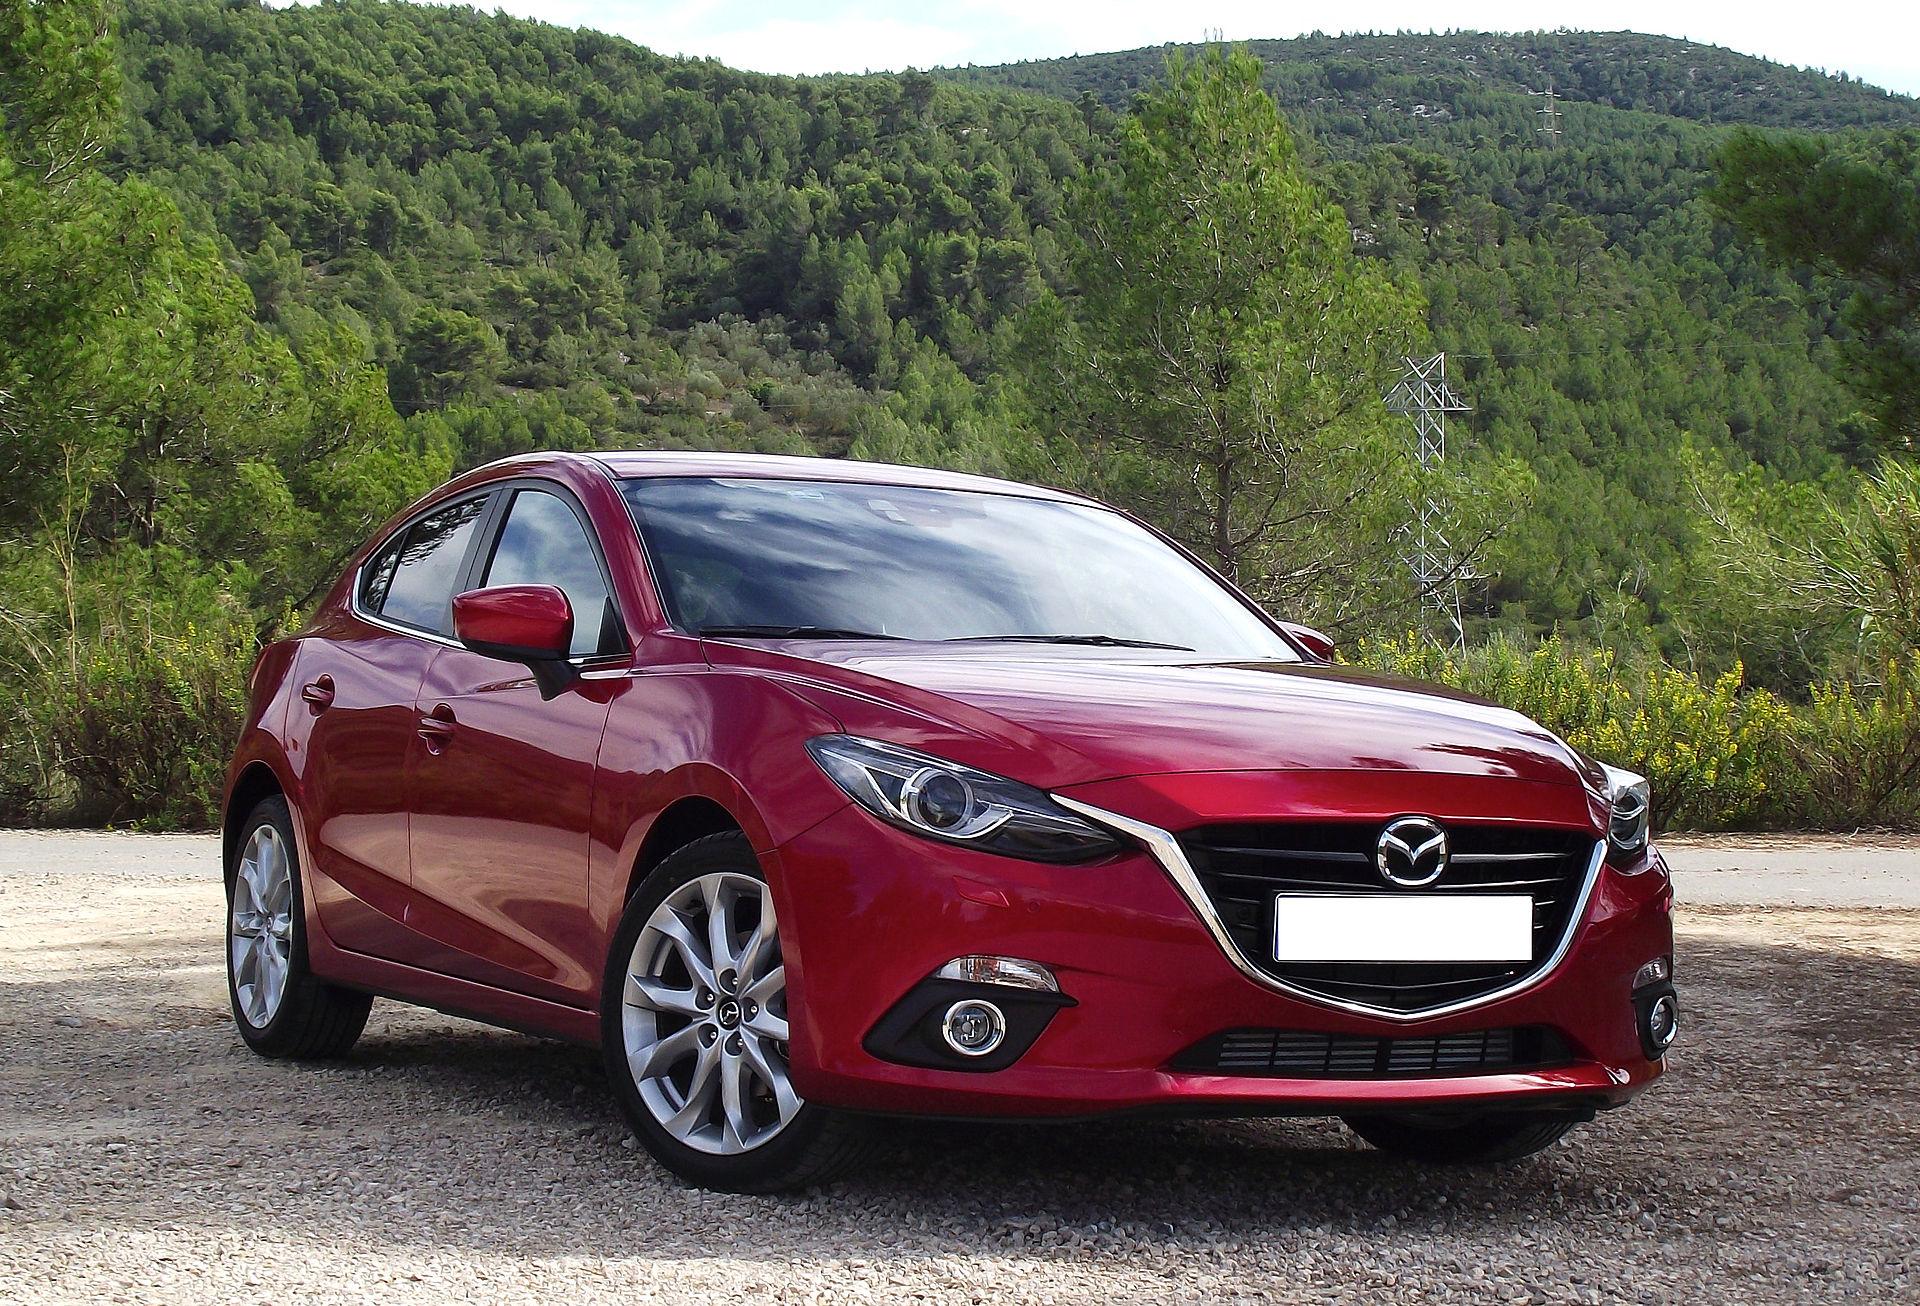 2016 Mazda Mazda3 ITouring U2013 Starting At $19,595